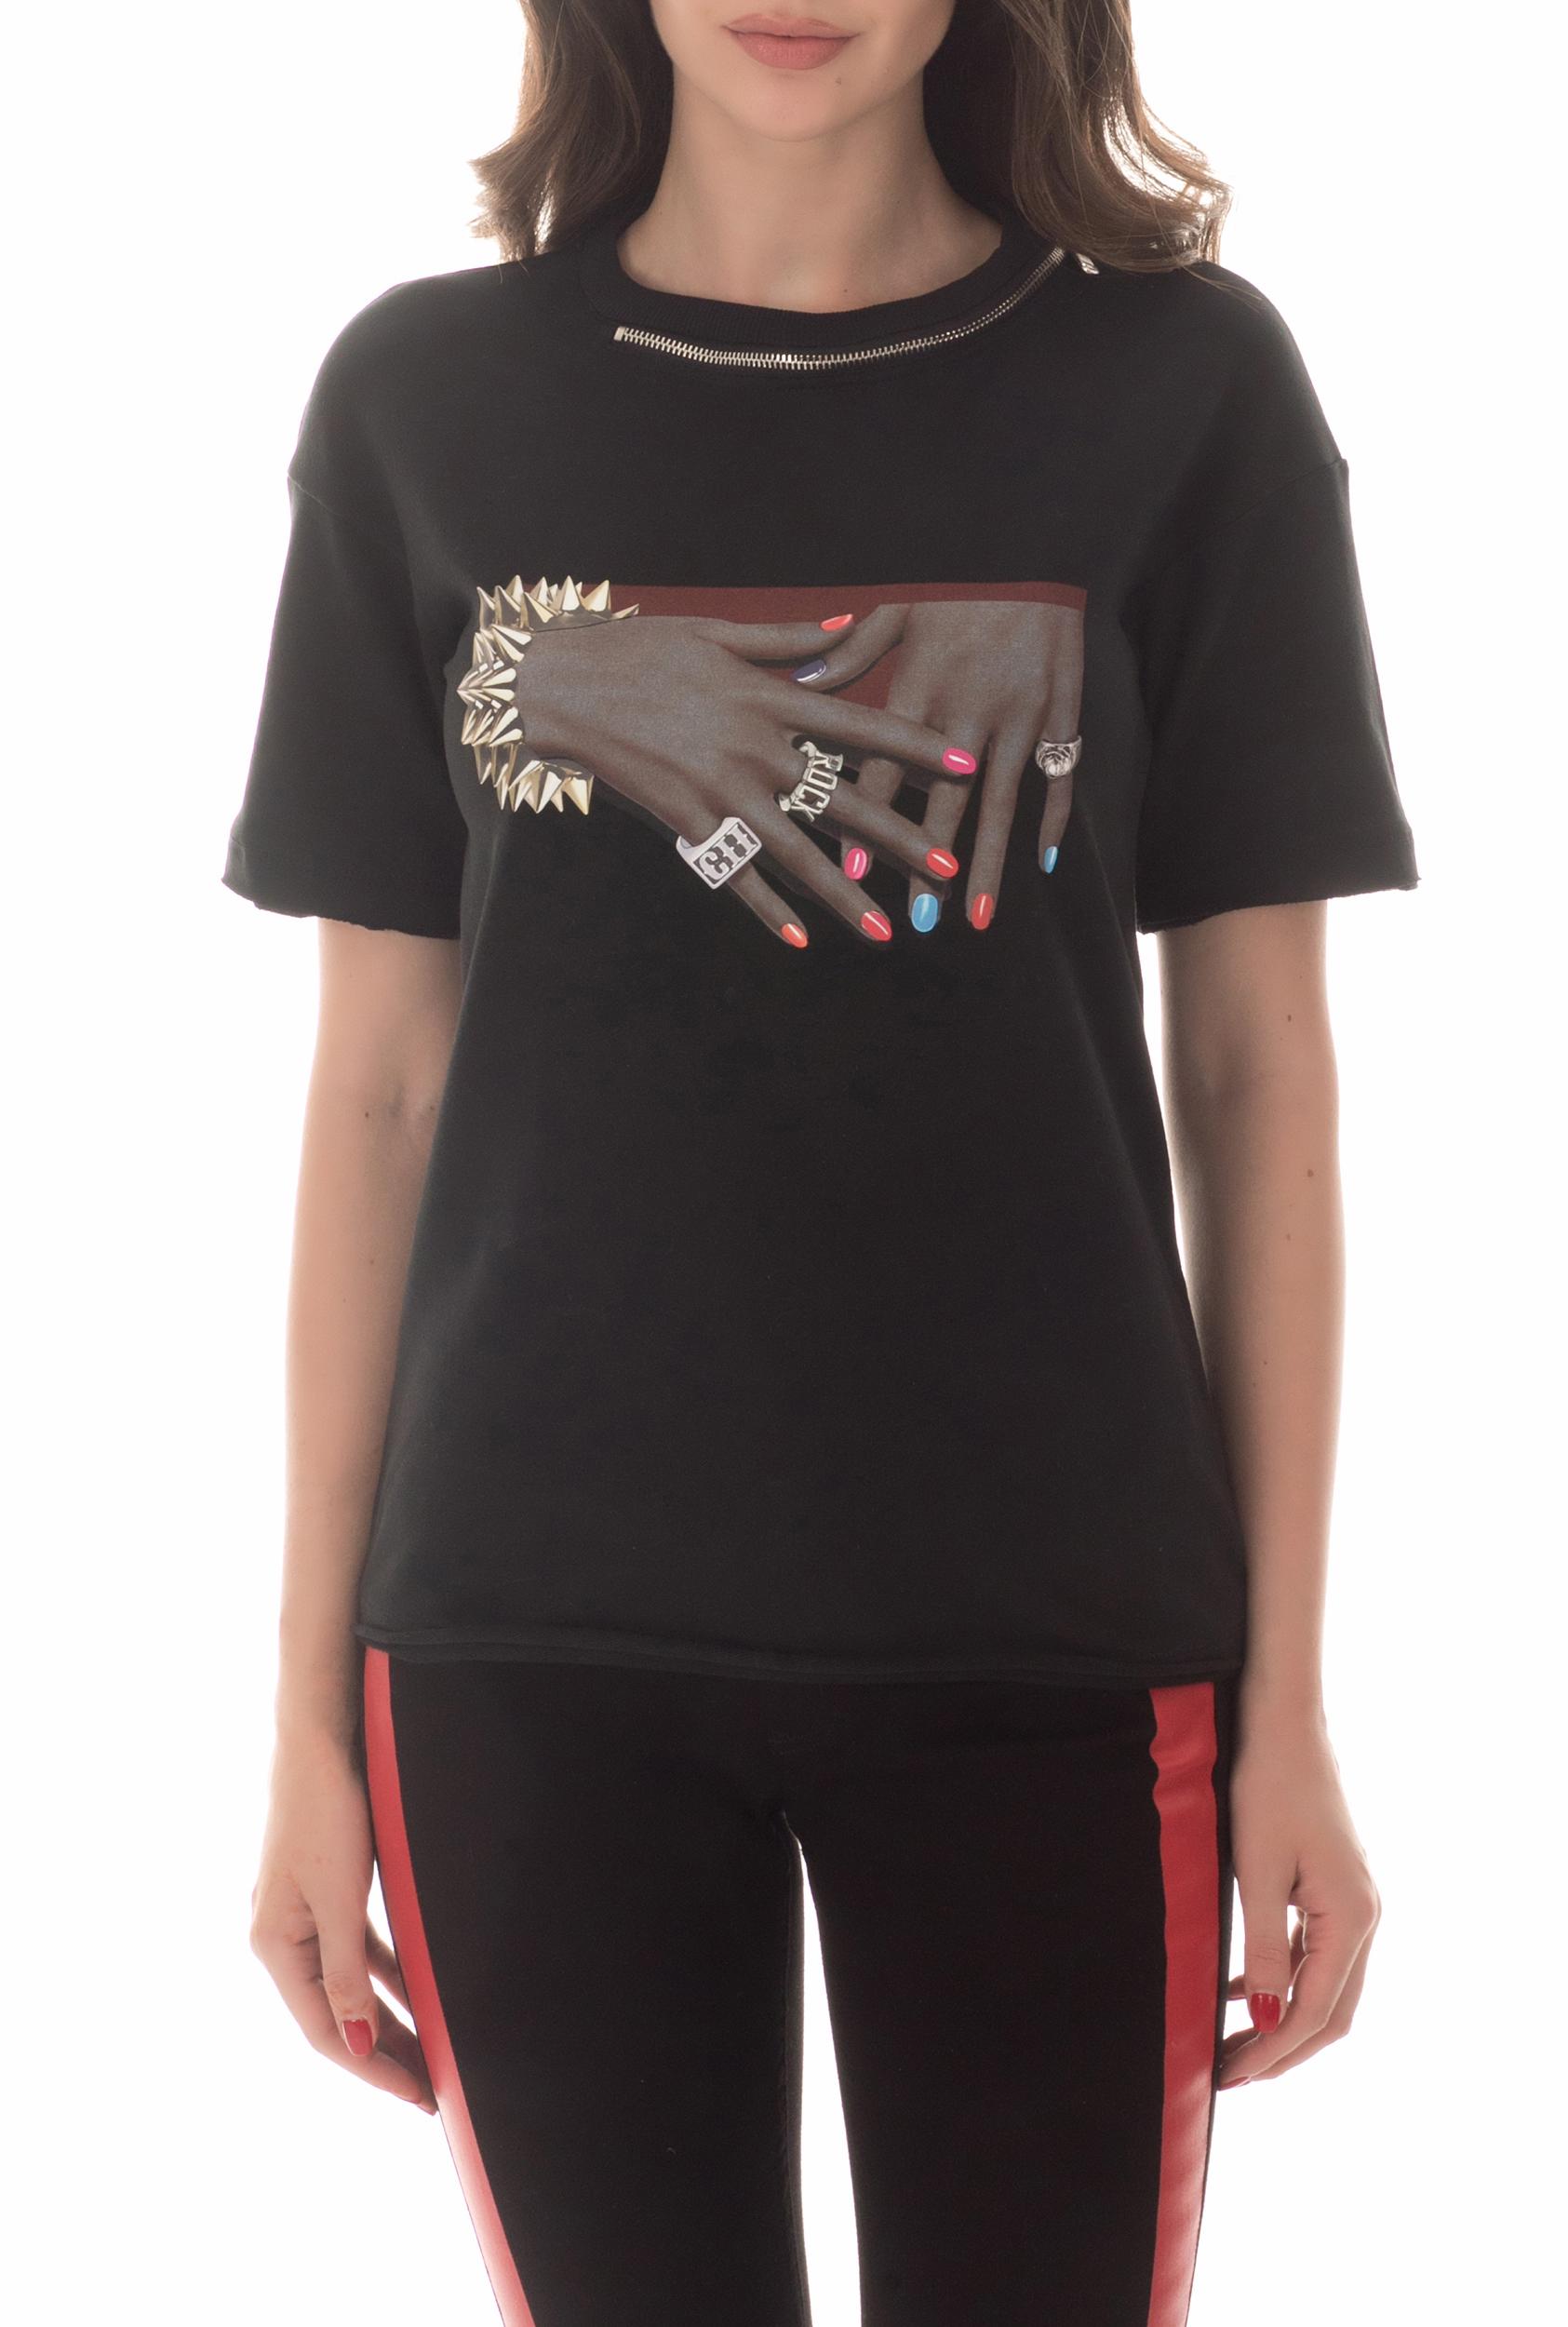 BYBLOS - Γυναικείο t-shirt BYBLOS μαύρο